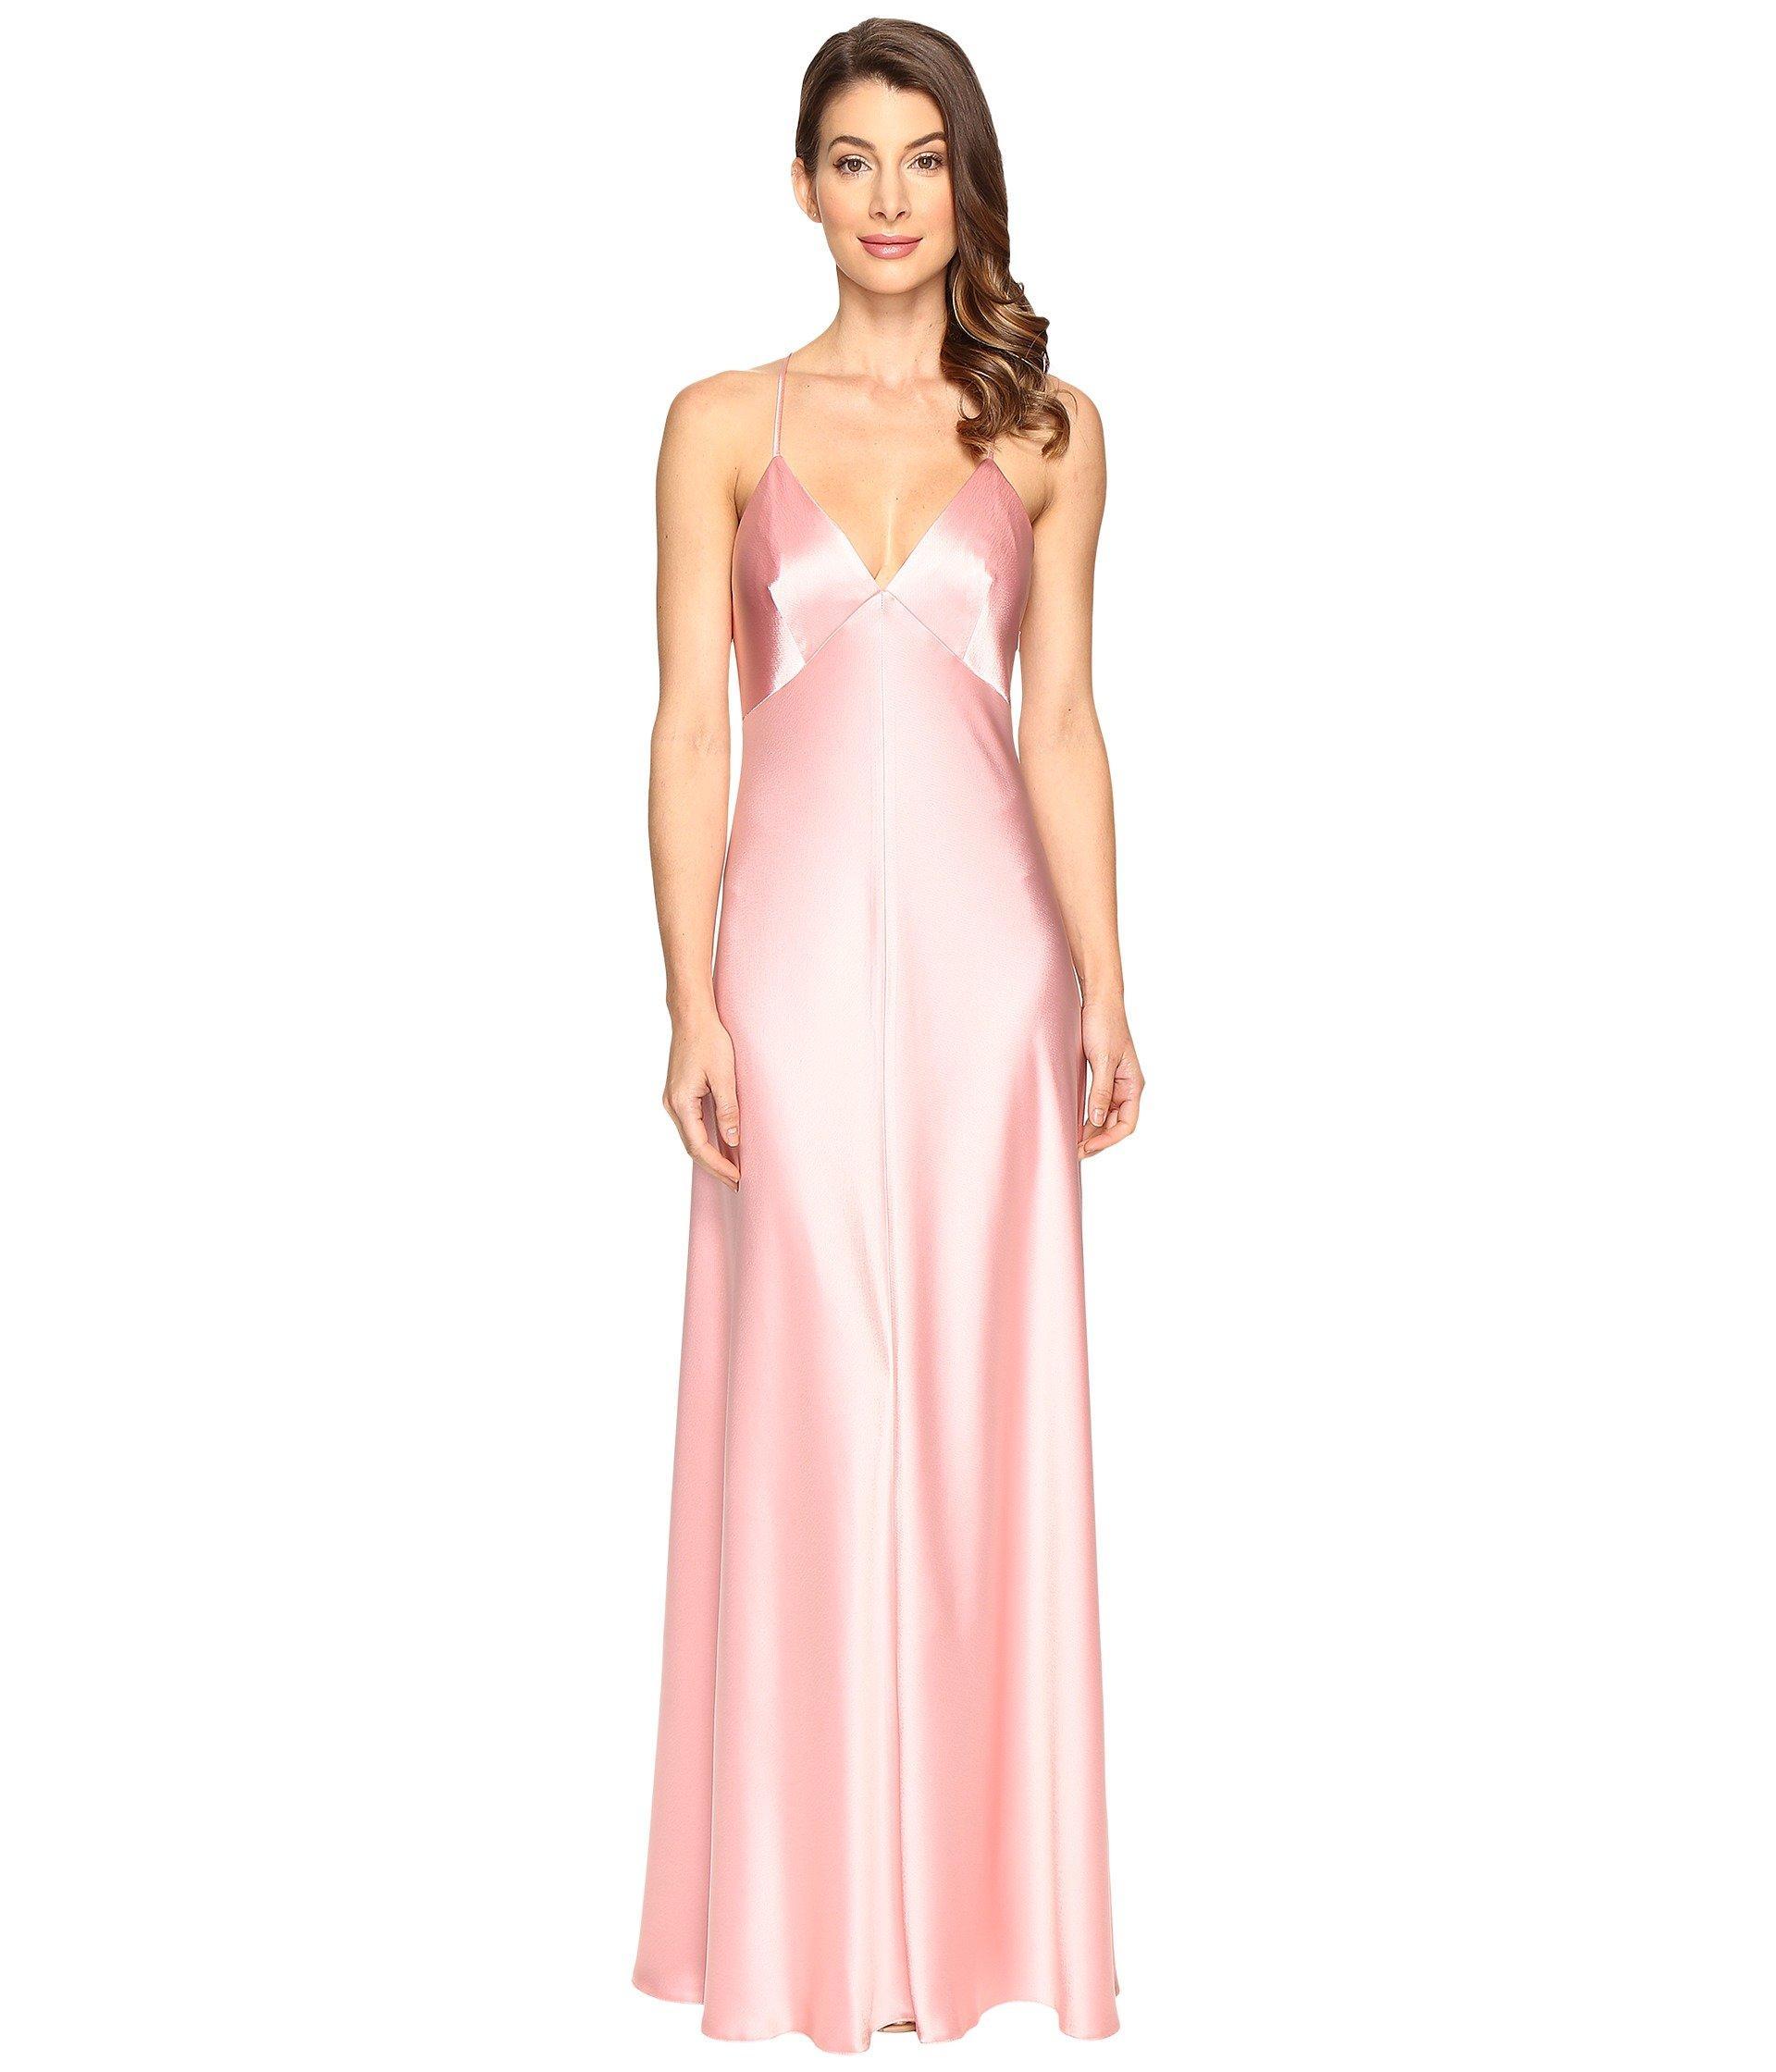 9a035f14b941 Jill Jill Stuart Satin Back Crepe Slip Dress In Peach Blossom | ModeSens